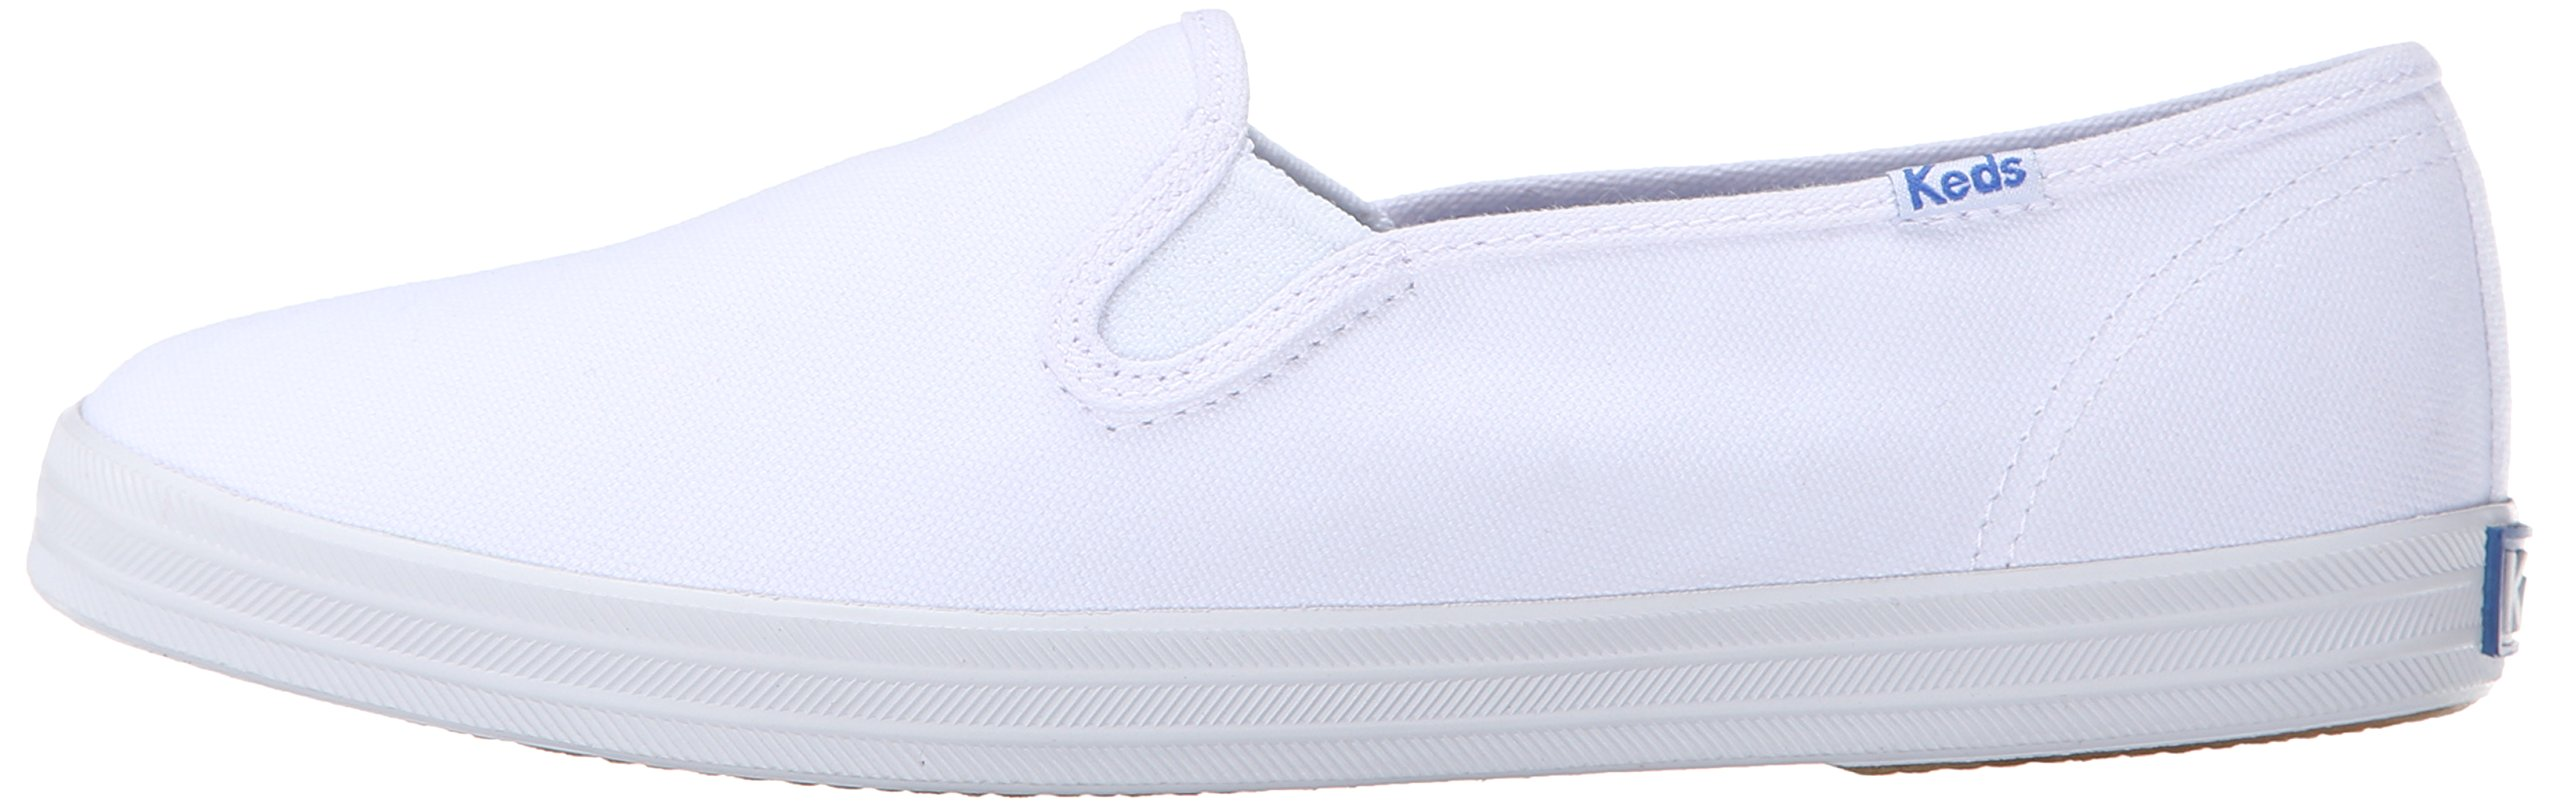 c9a51f044dc13 Keds Champion Slip On Women 9.5 White - WF23240   Fashion Sneakers    Clothing